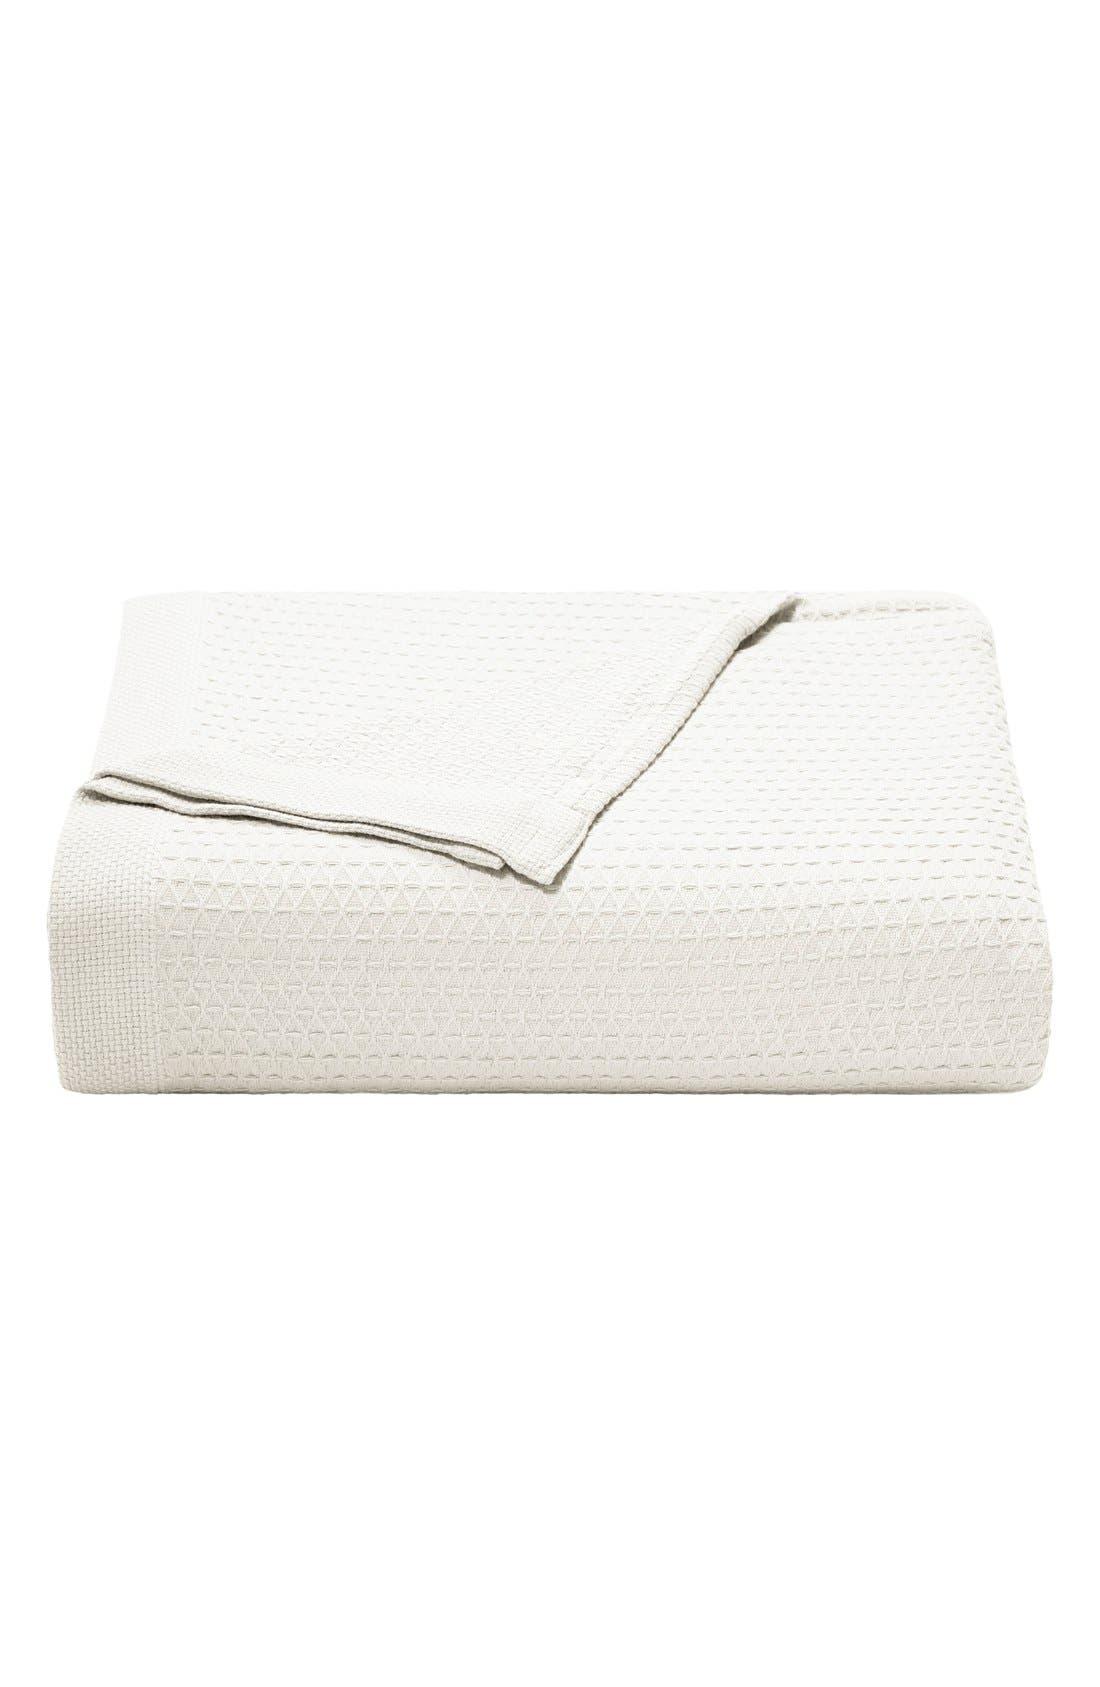 'Baird' Cotton Blanket,                             Main thumbnail 1, color,                             WHITE